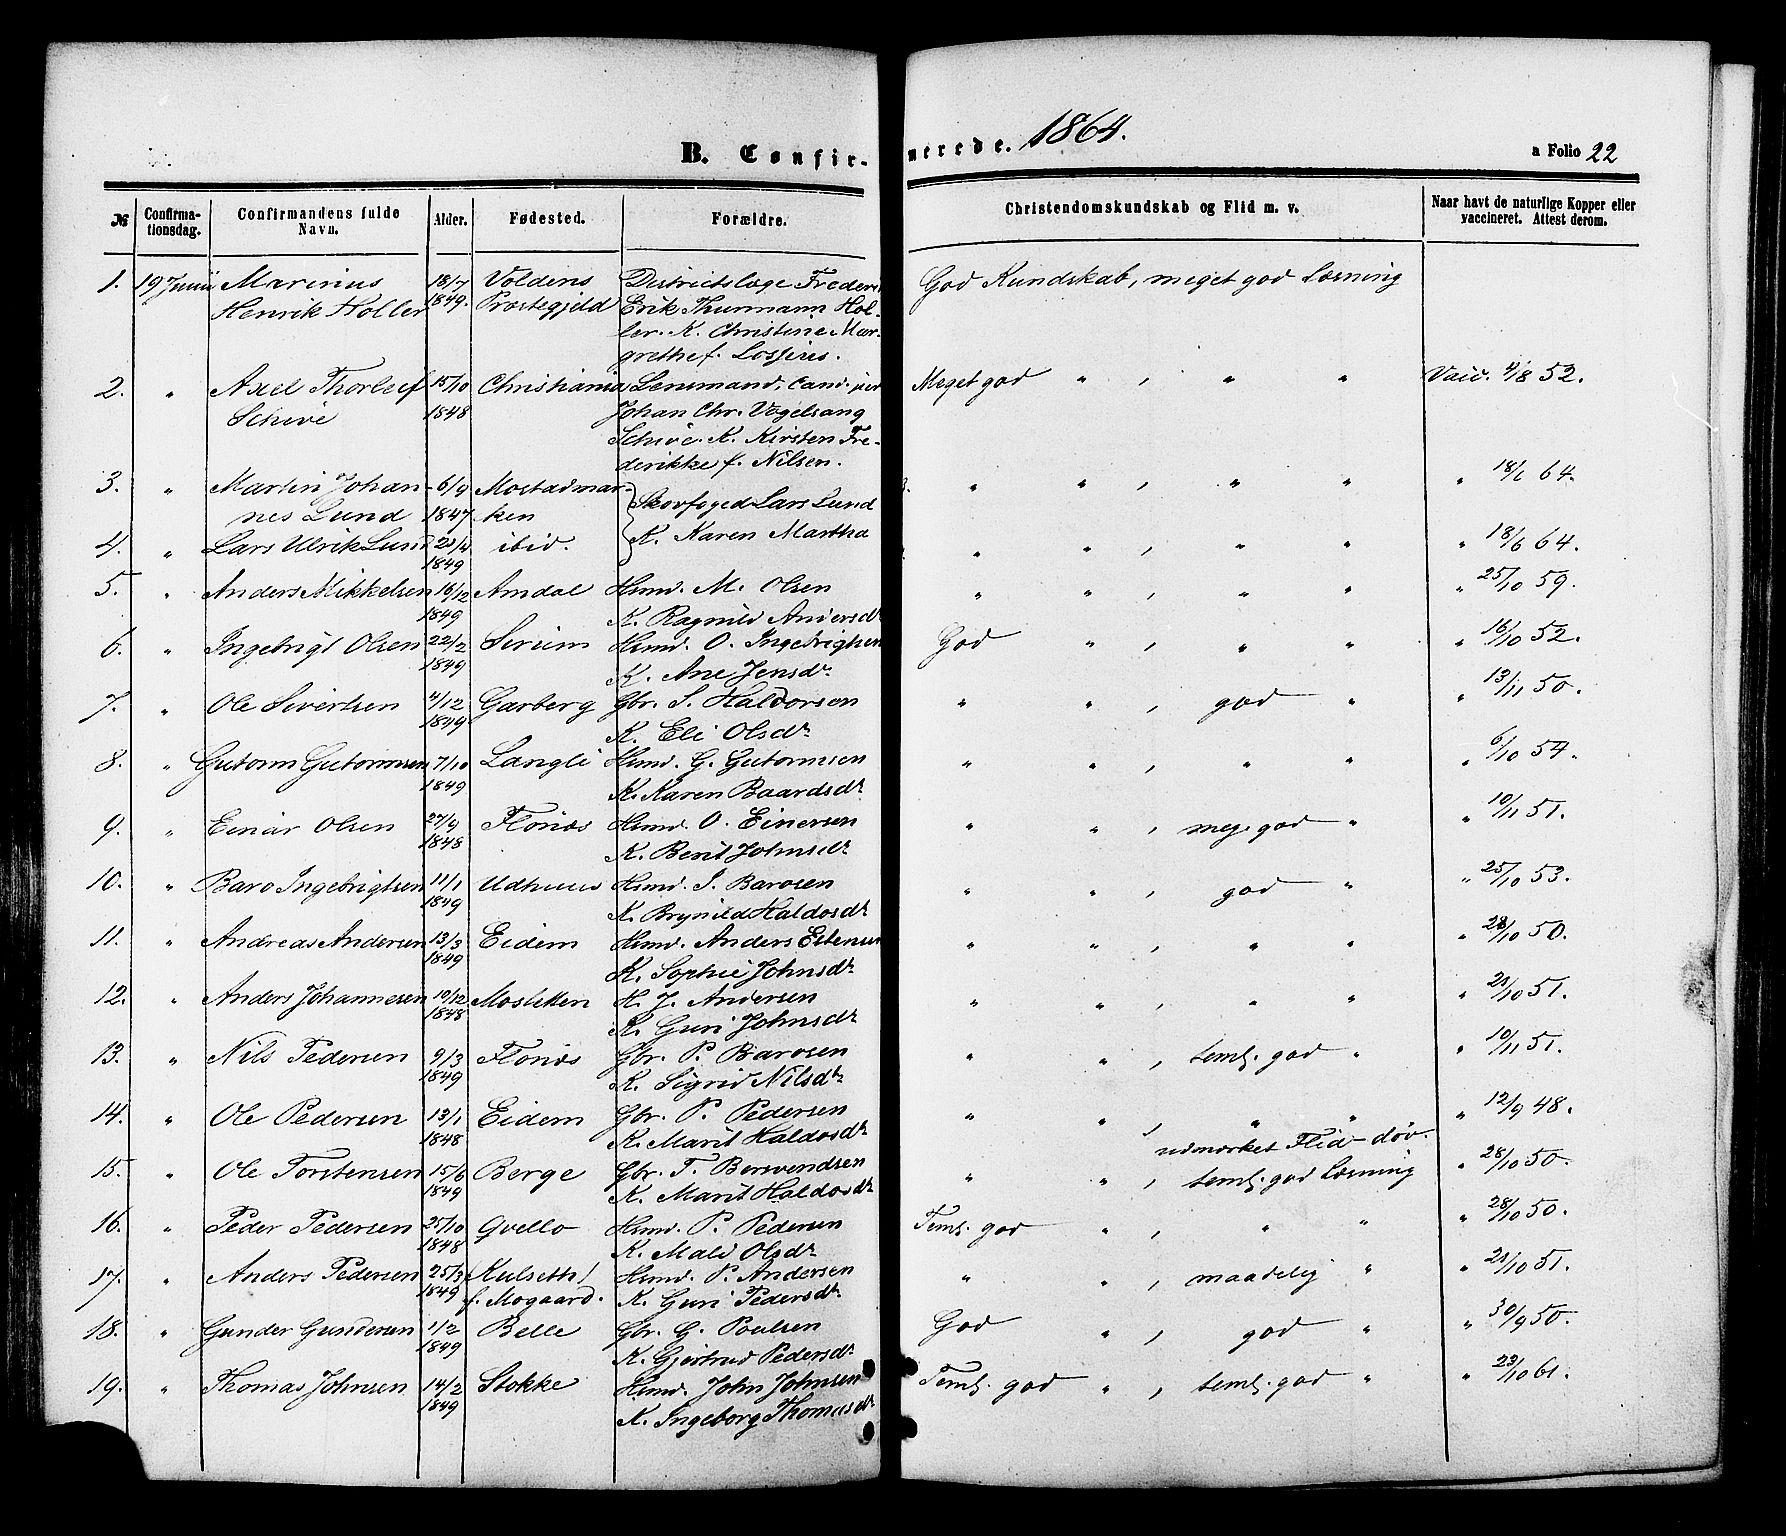 SAT, Ministerialprotokoller, klokkerbøker og fødselsregistre - Sør-Trøndelag, 695/L1147: Parish register (official) no. 695A07, 1860-1877, p. 22